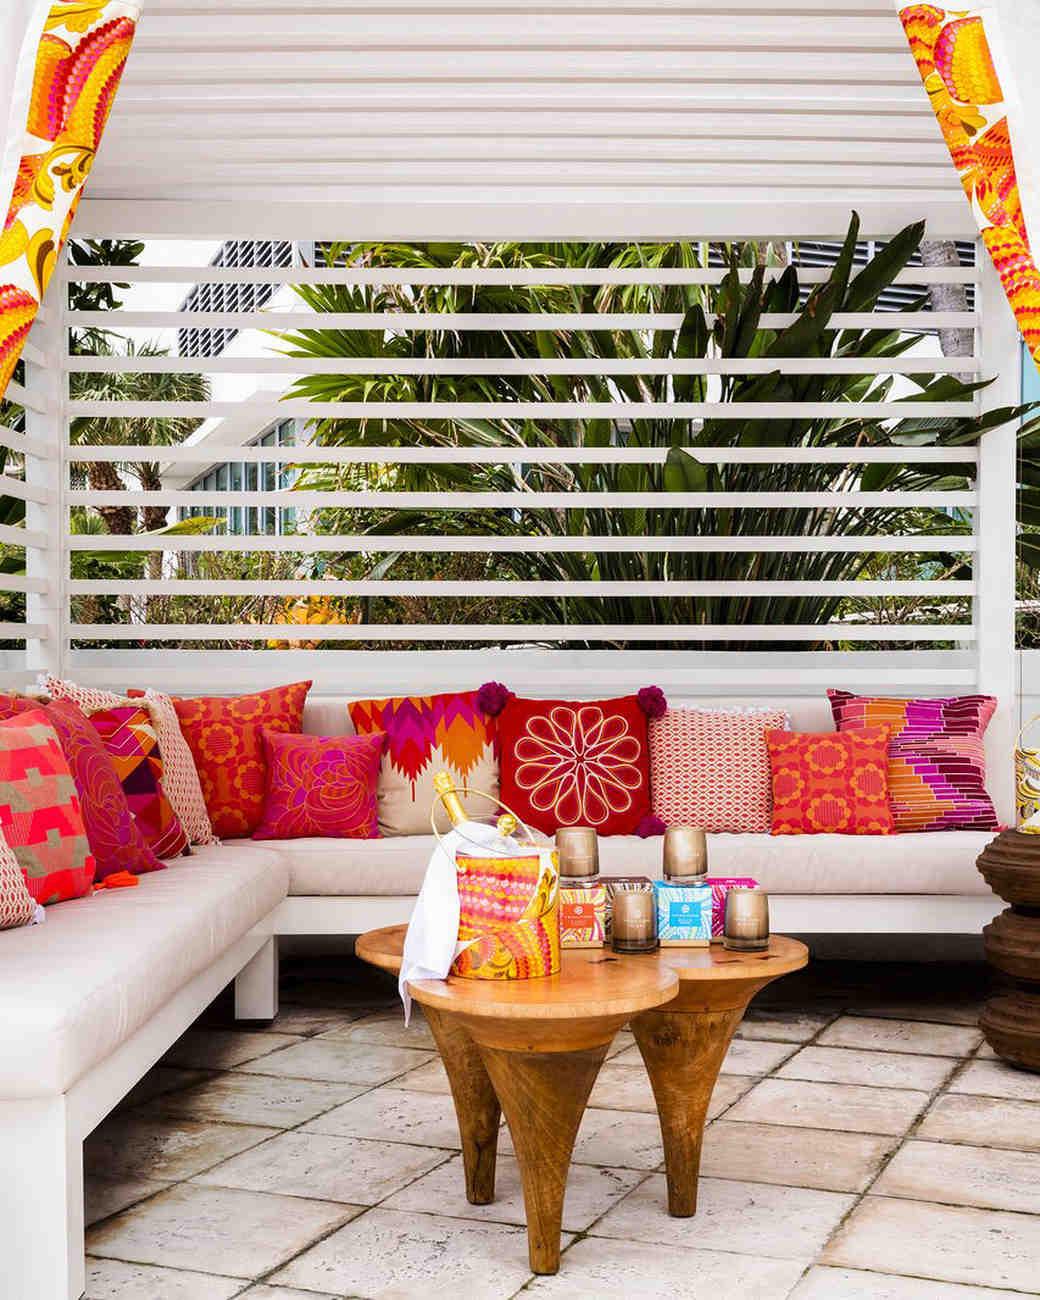 new venue outdoor cabana bright pillows